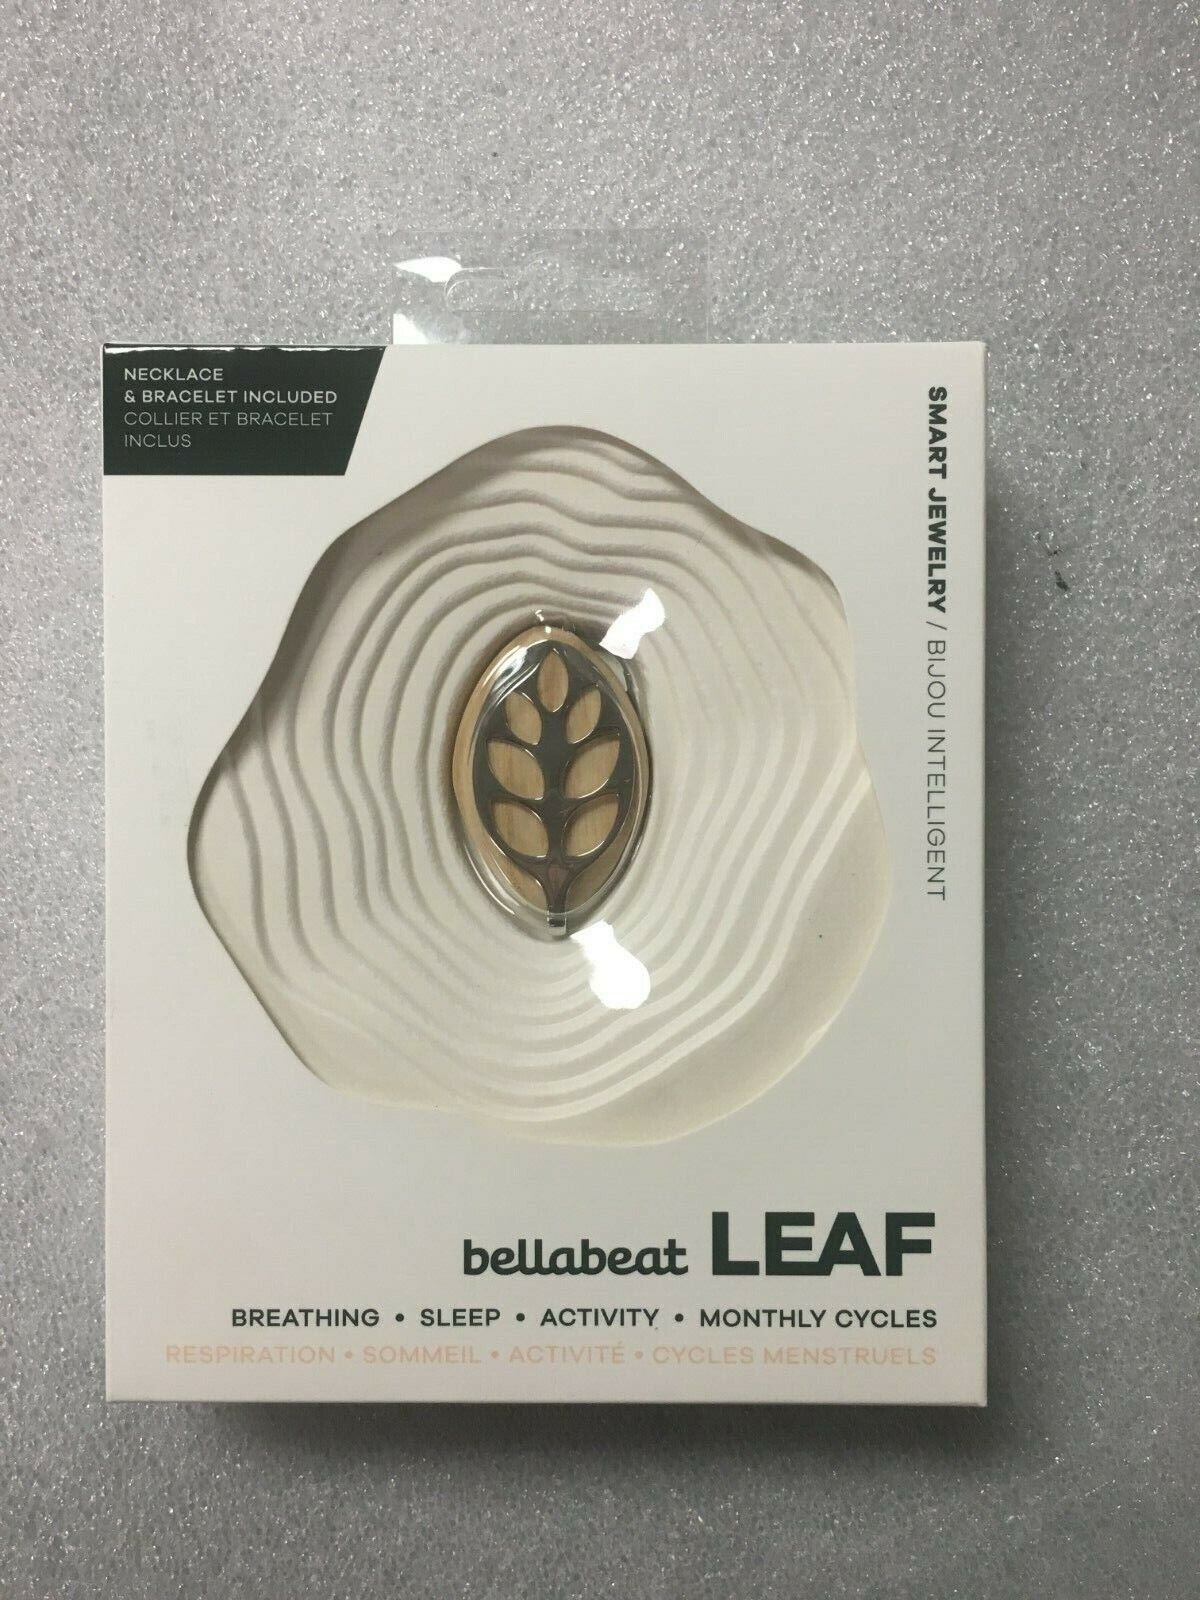 Bellabeat Leaf Nature Health Tracker Smart Jewelry Silver Op